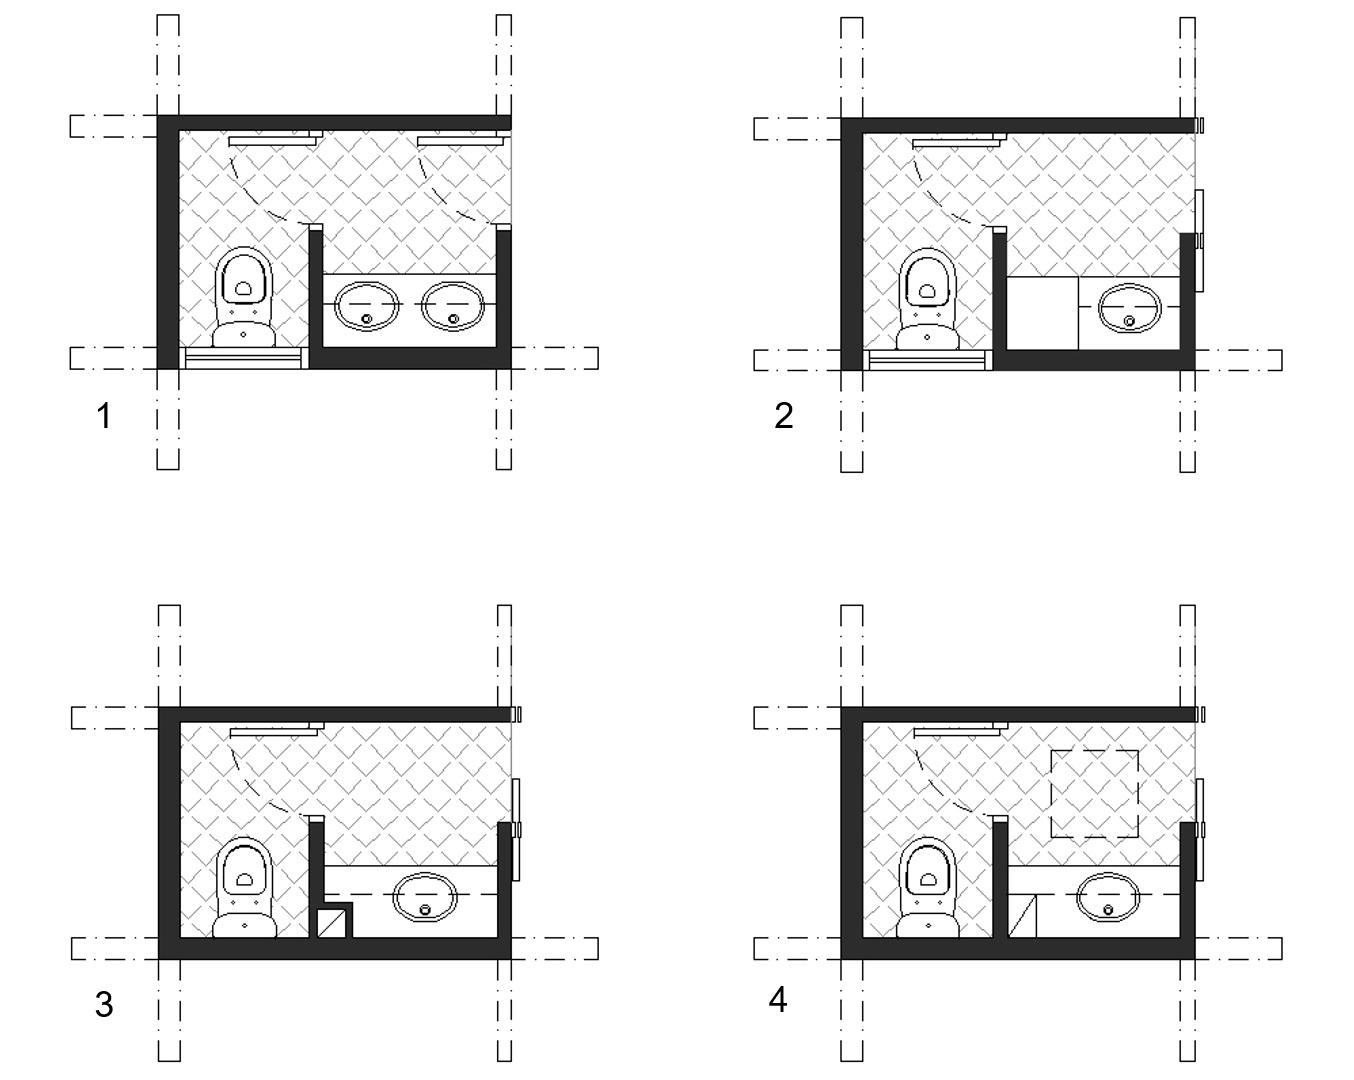 powder room floorplan divisions